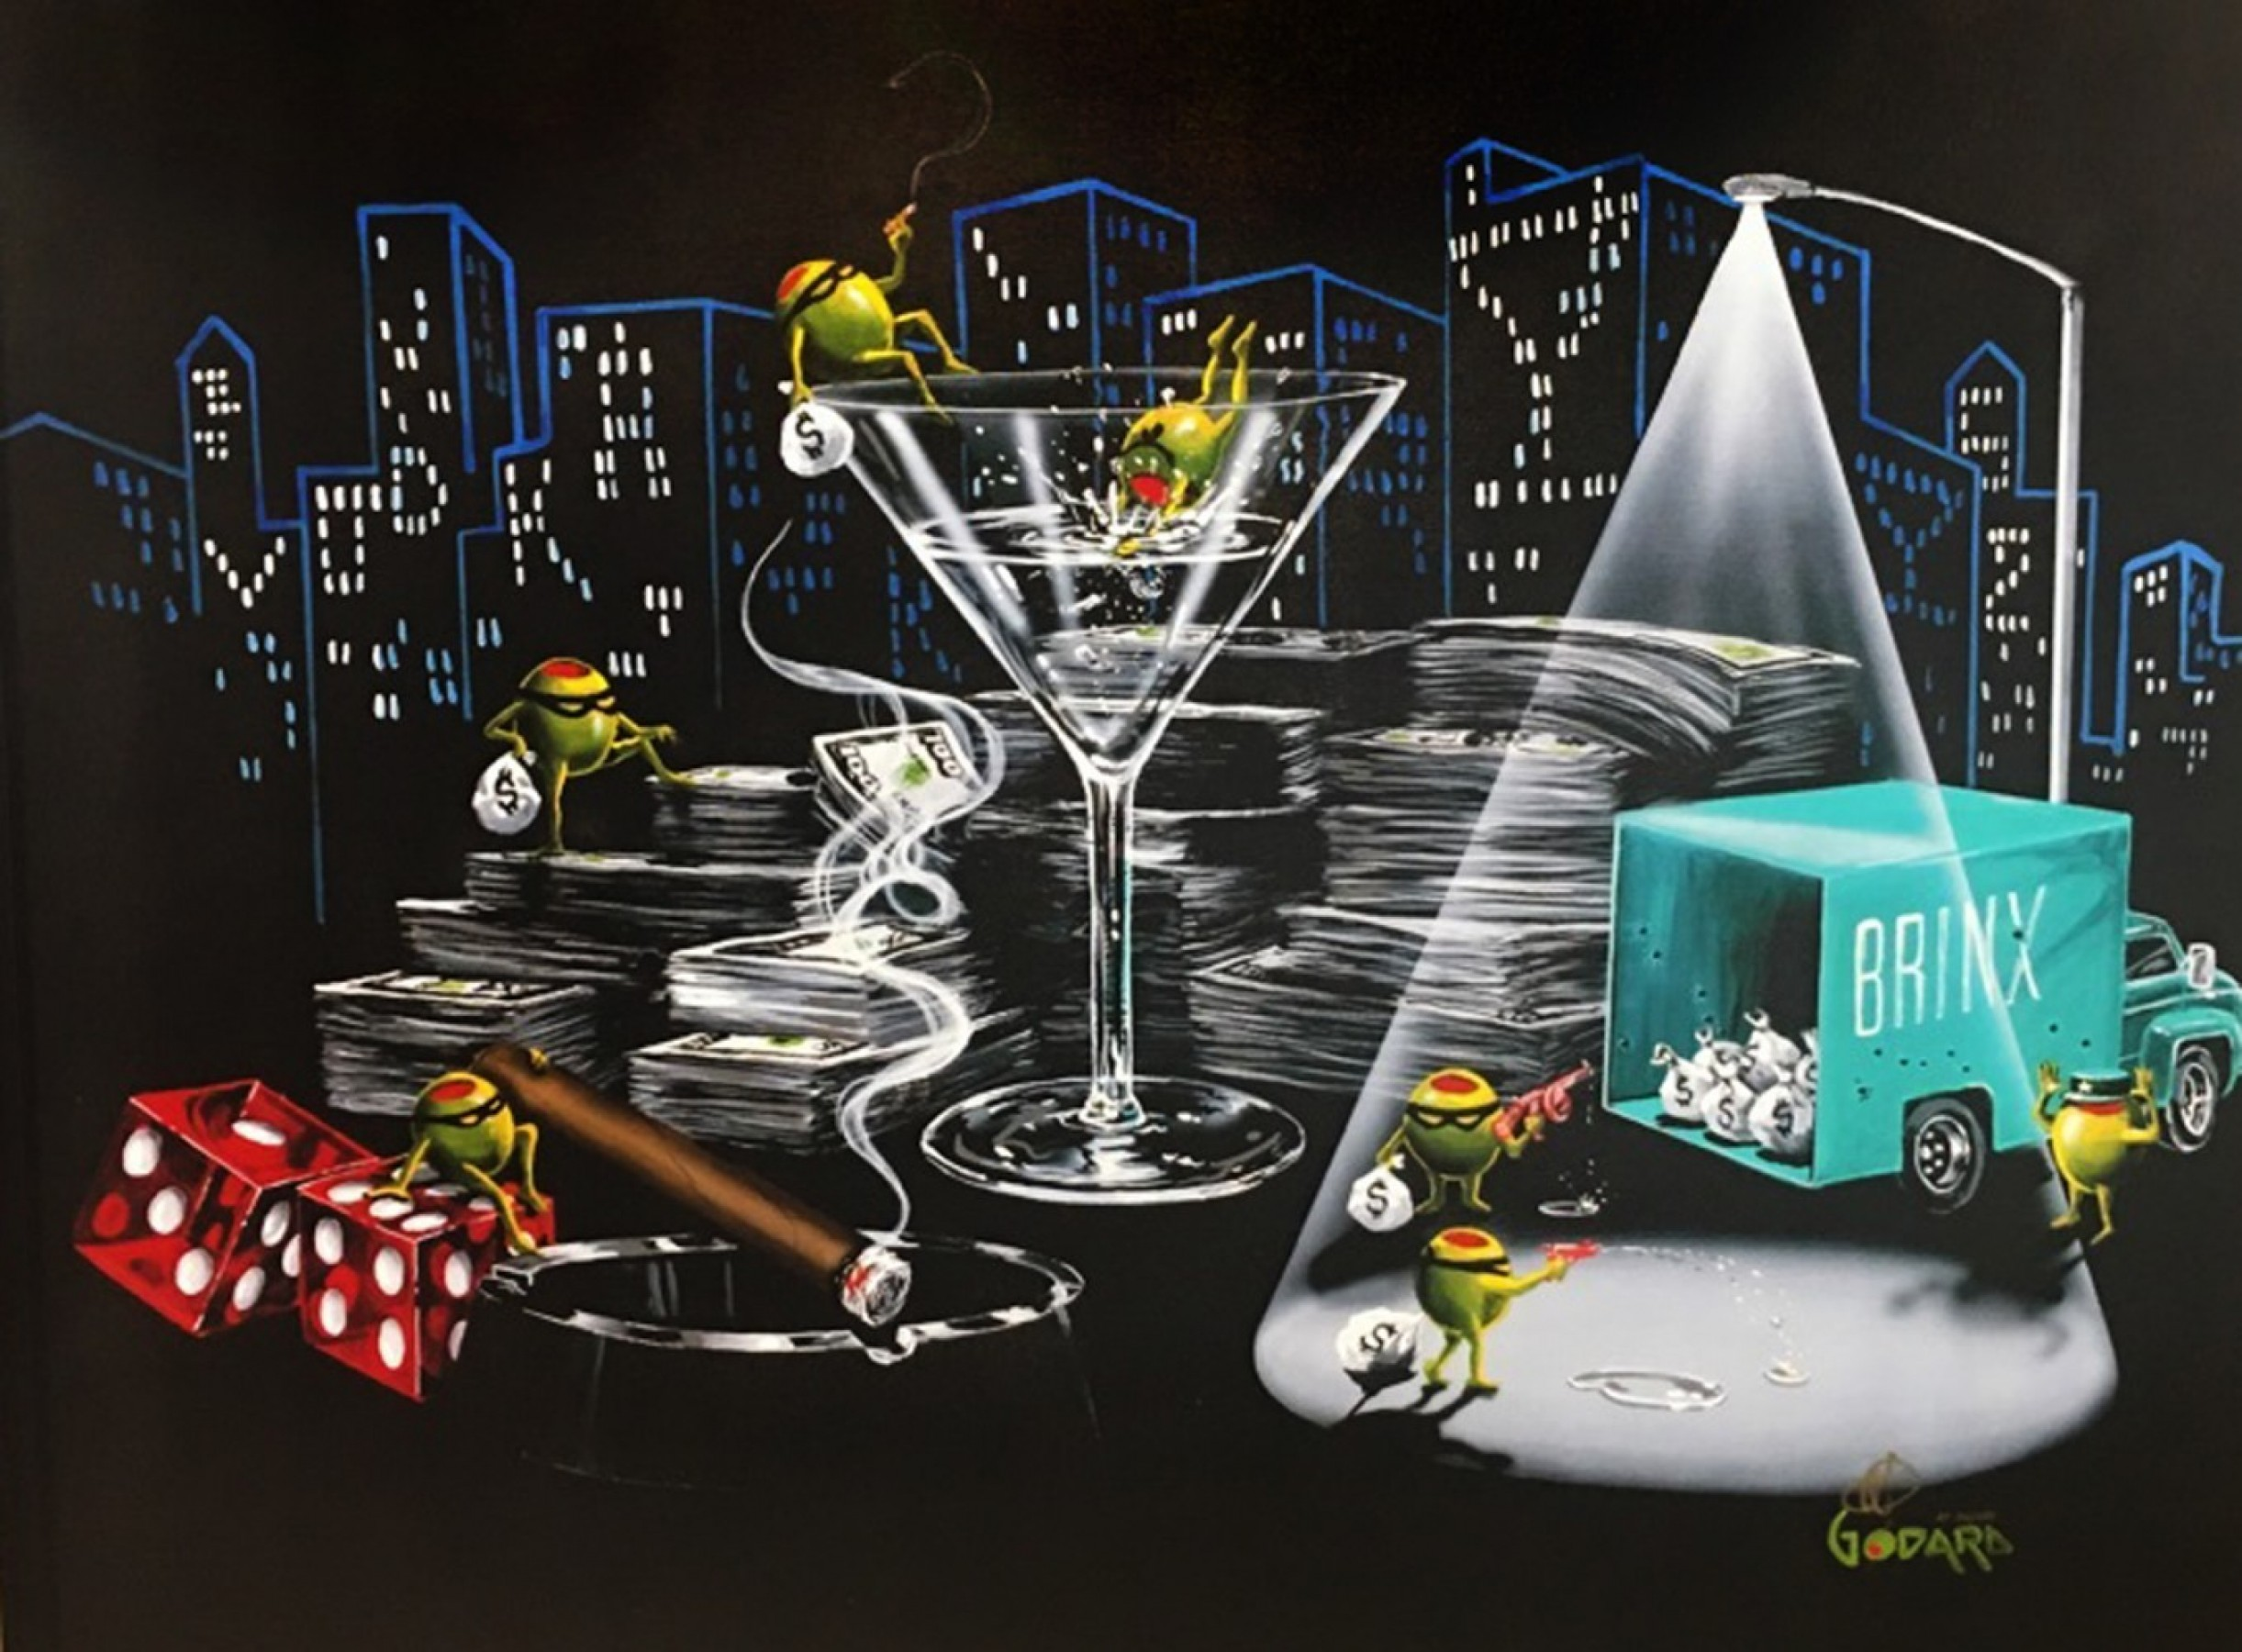 Michael Godard - Park West Gallery |Micheal Godard Art